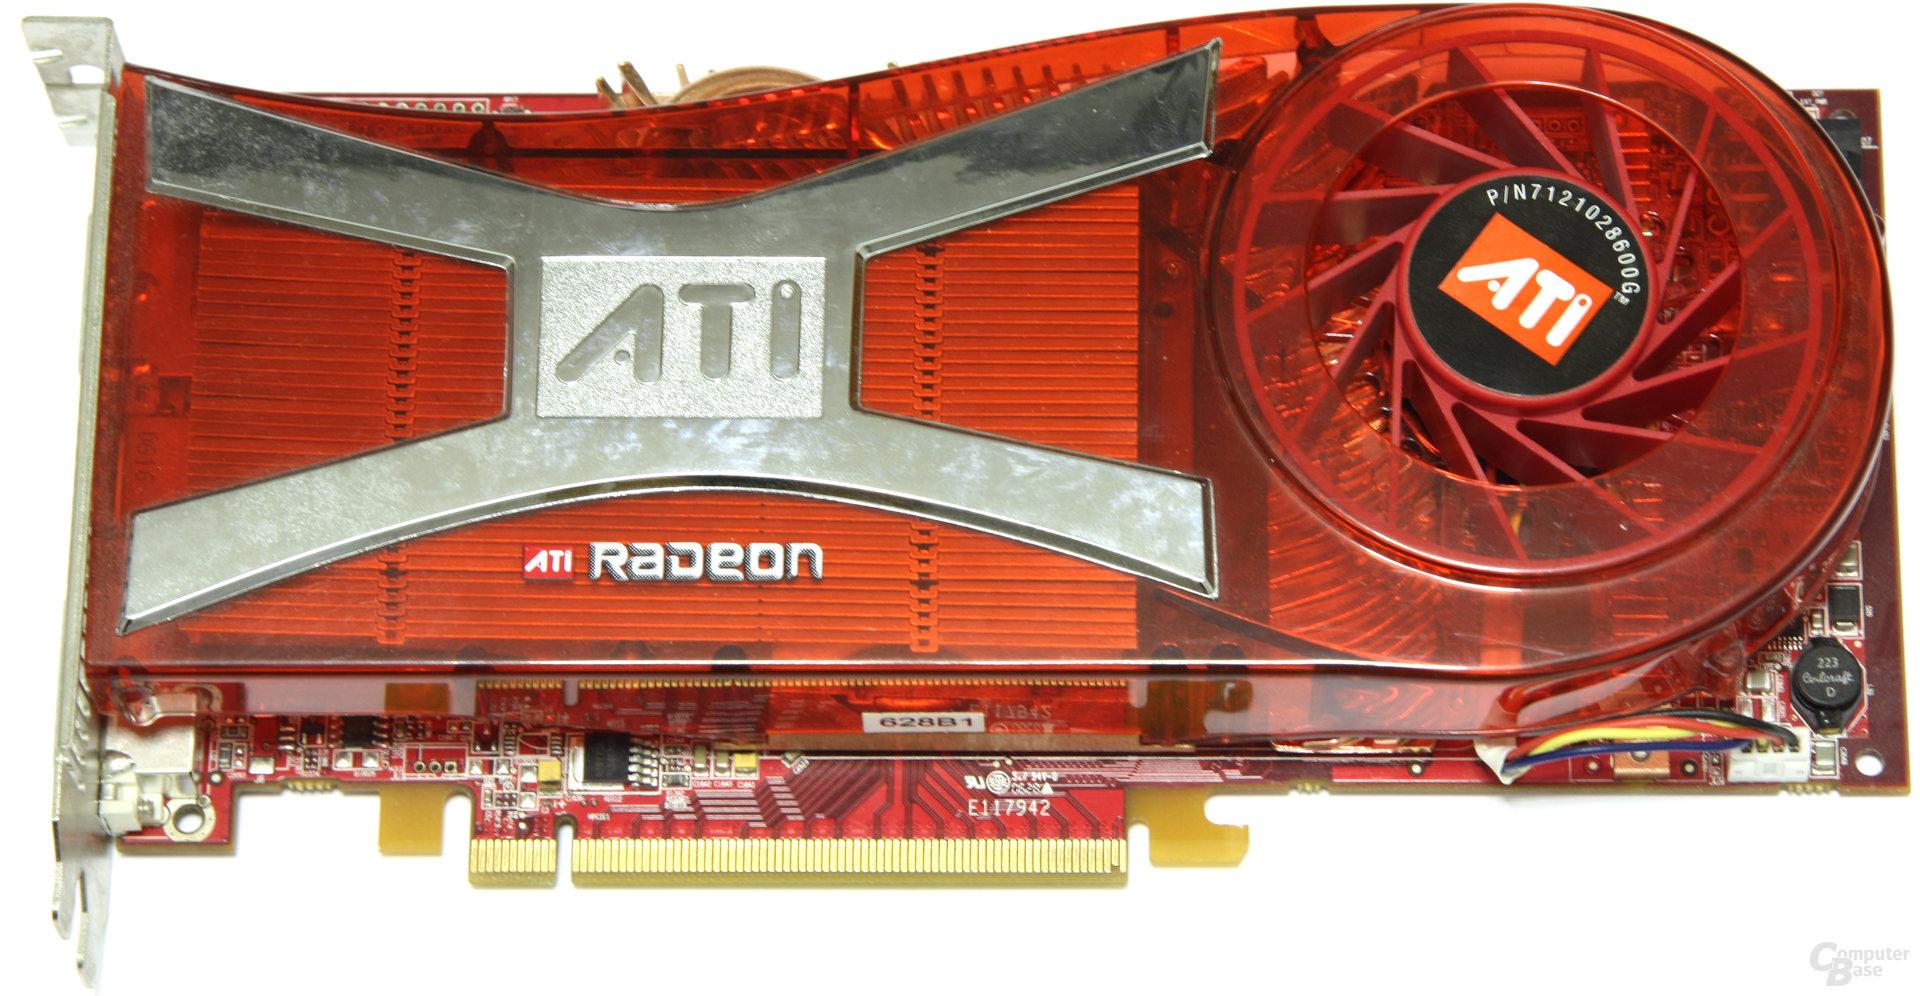 ATi Radeon X1950 XTX (2006)